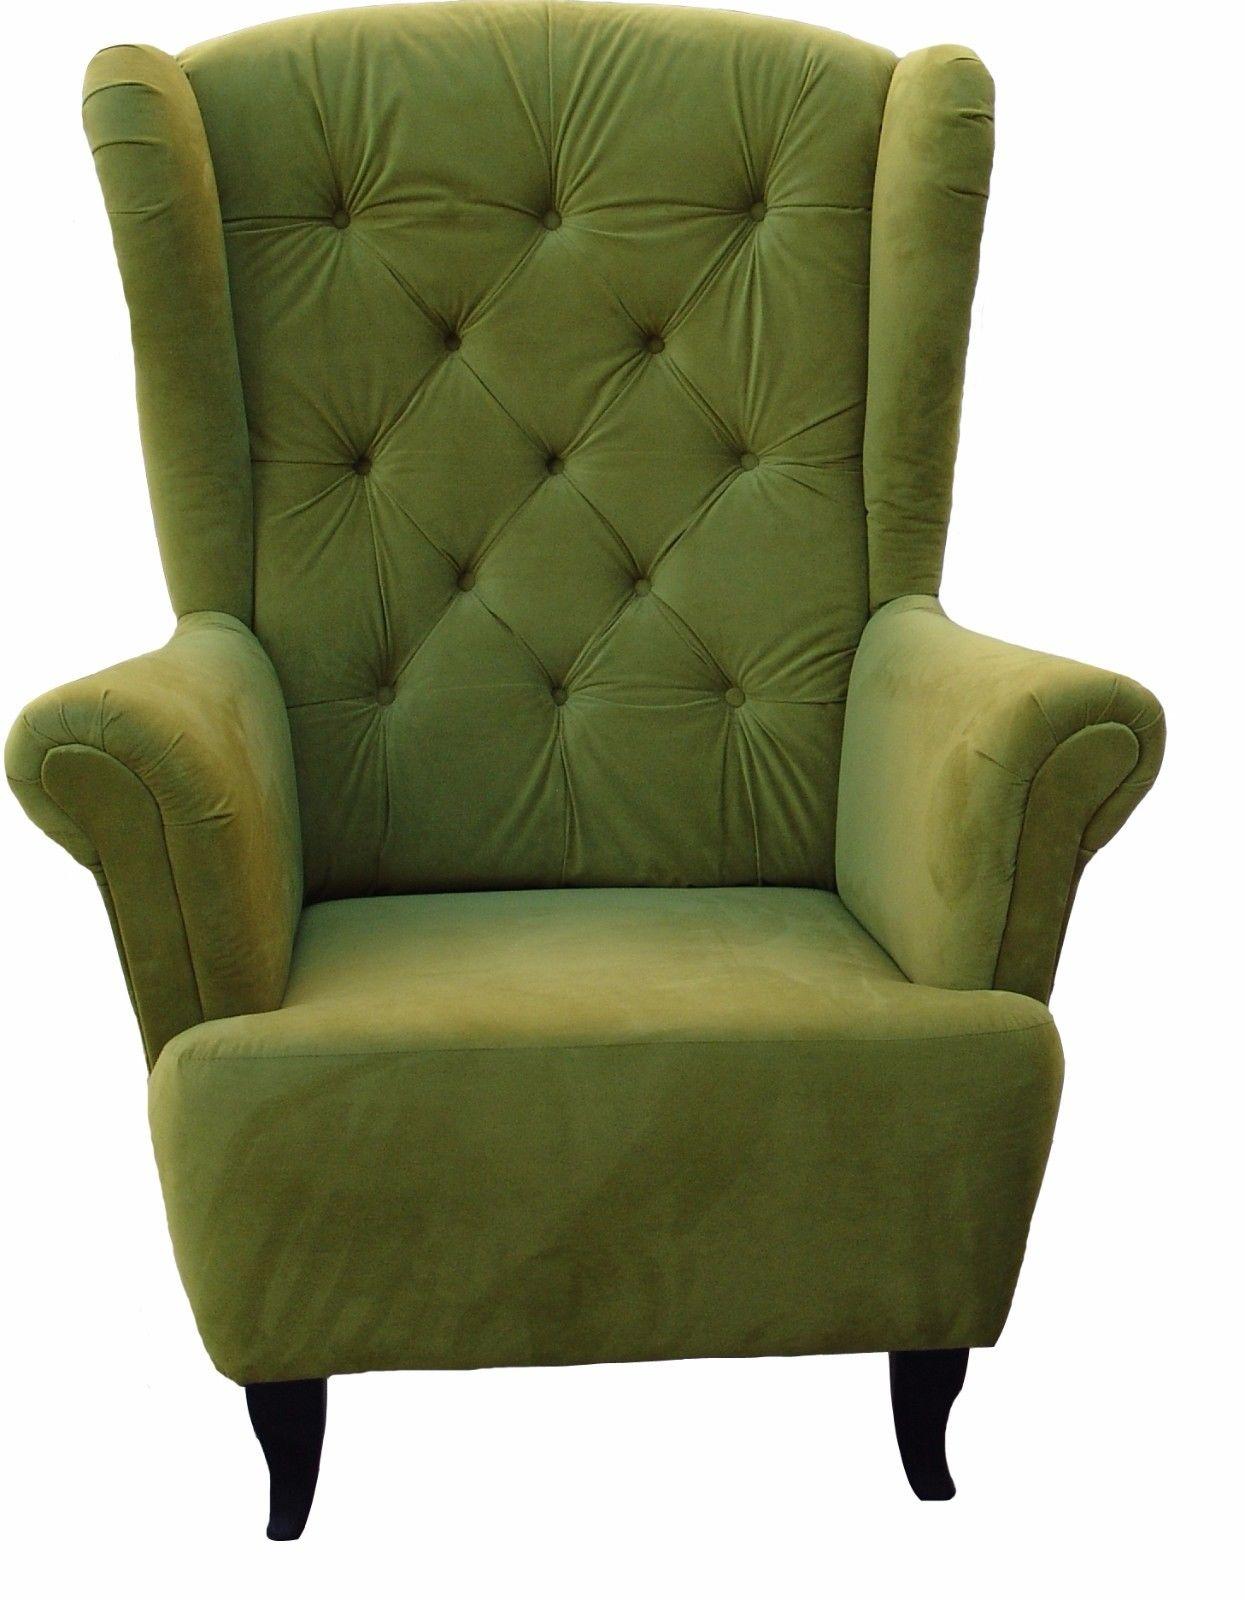 sessel ohrensessel wohnzimmersessel orlando webstoff weiss ebay. Black Bedroom Furniture Sets. Home Design Ideas